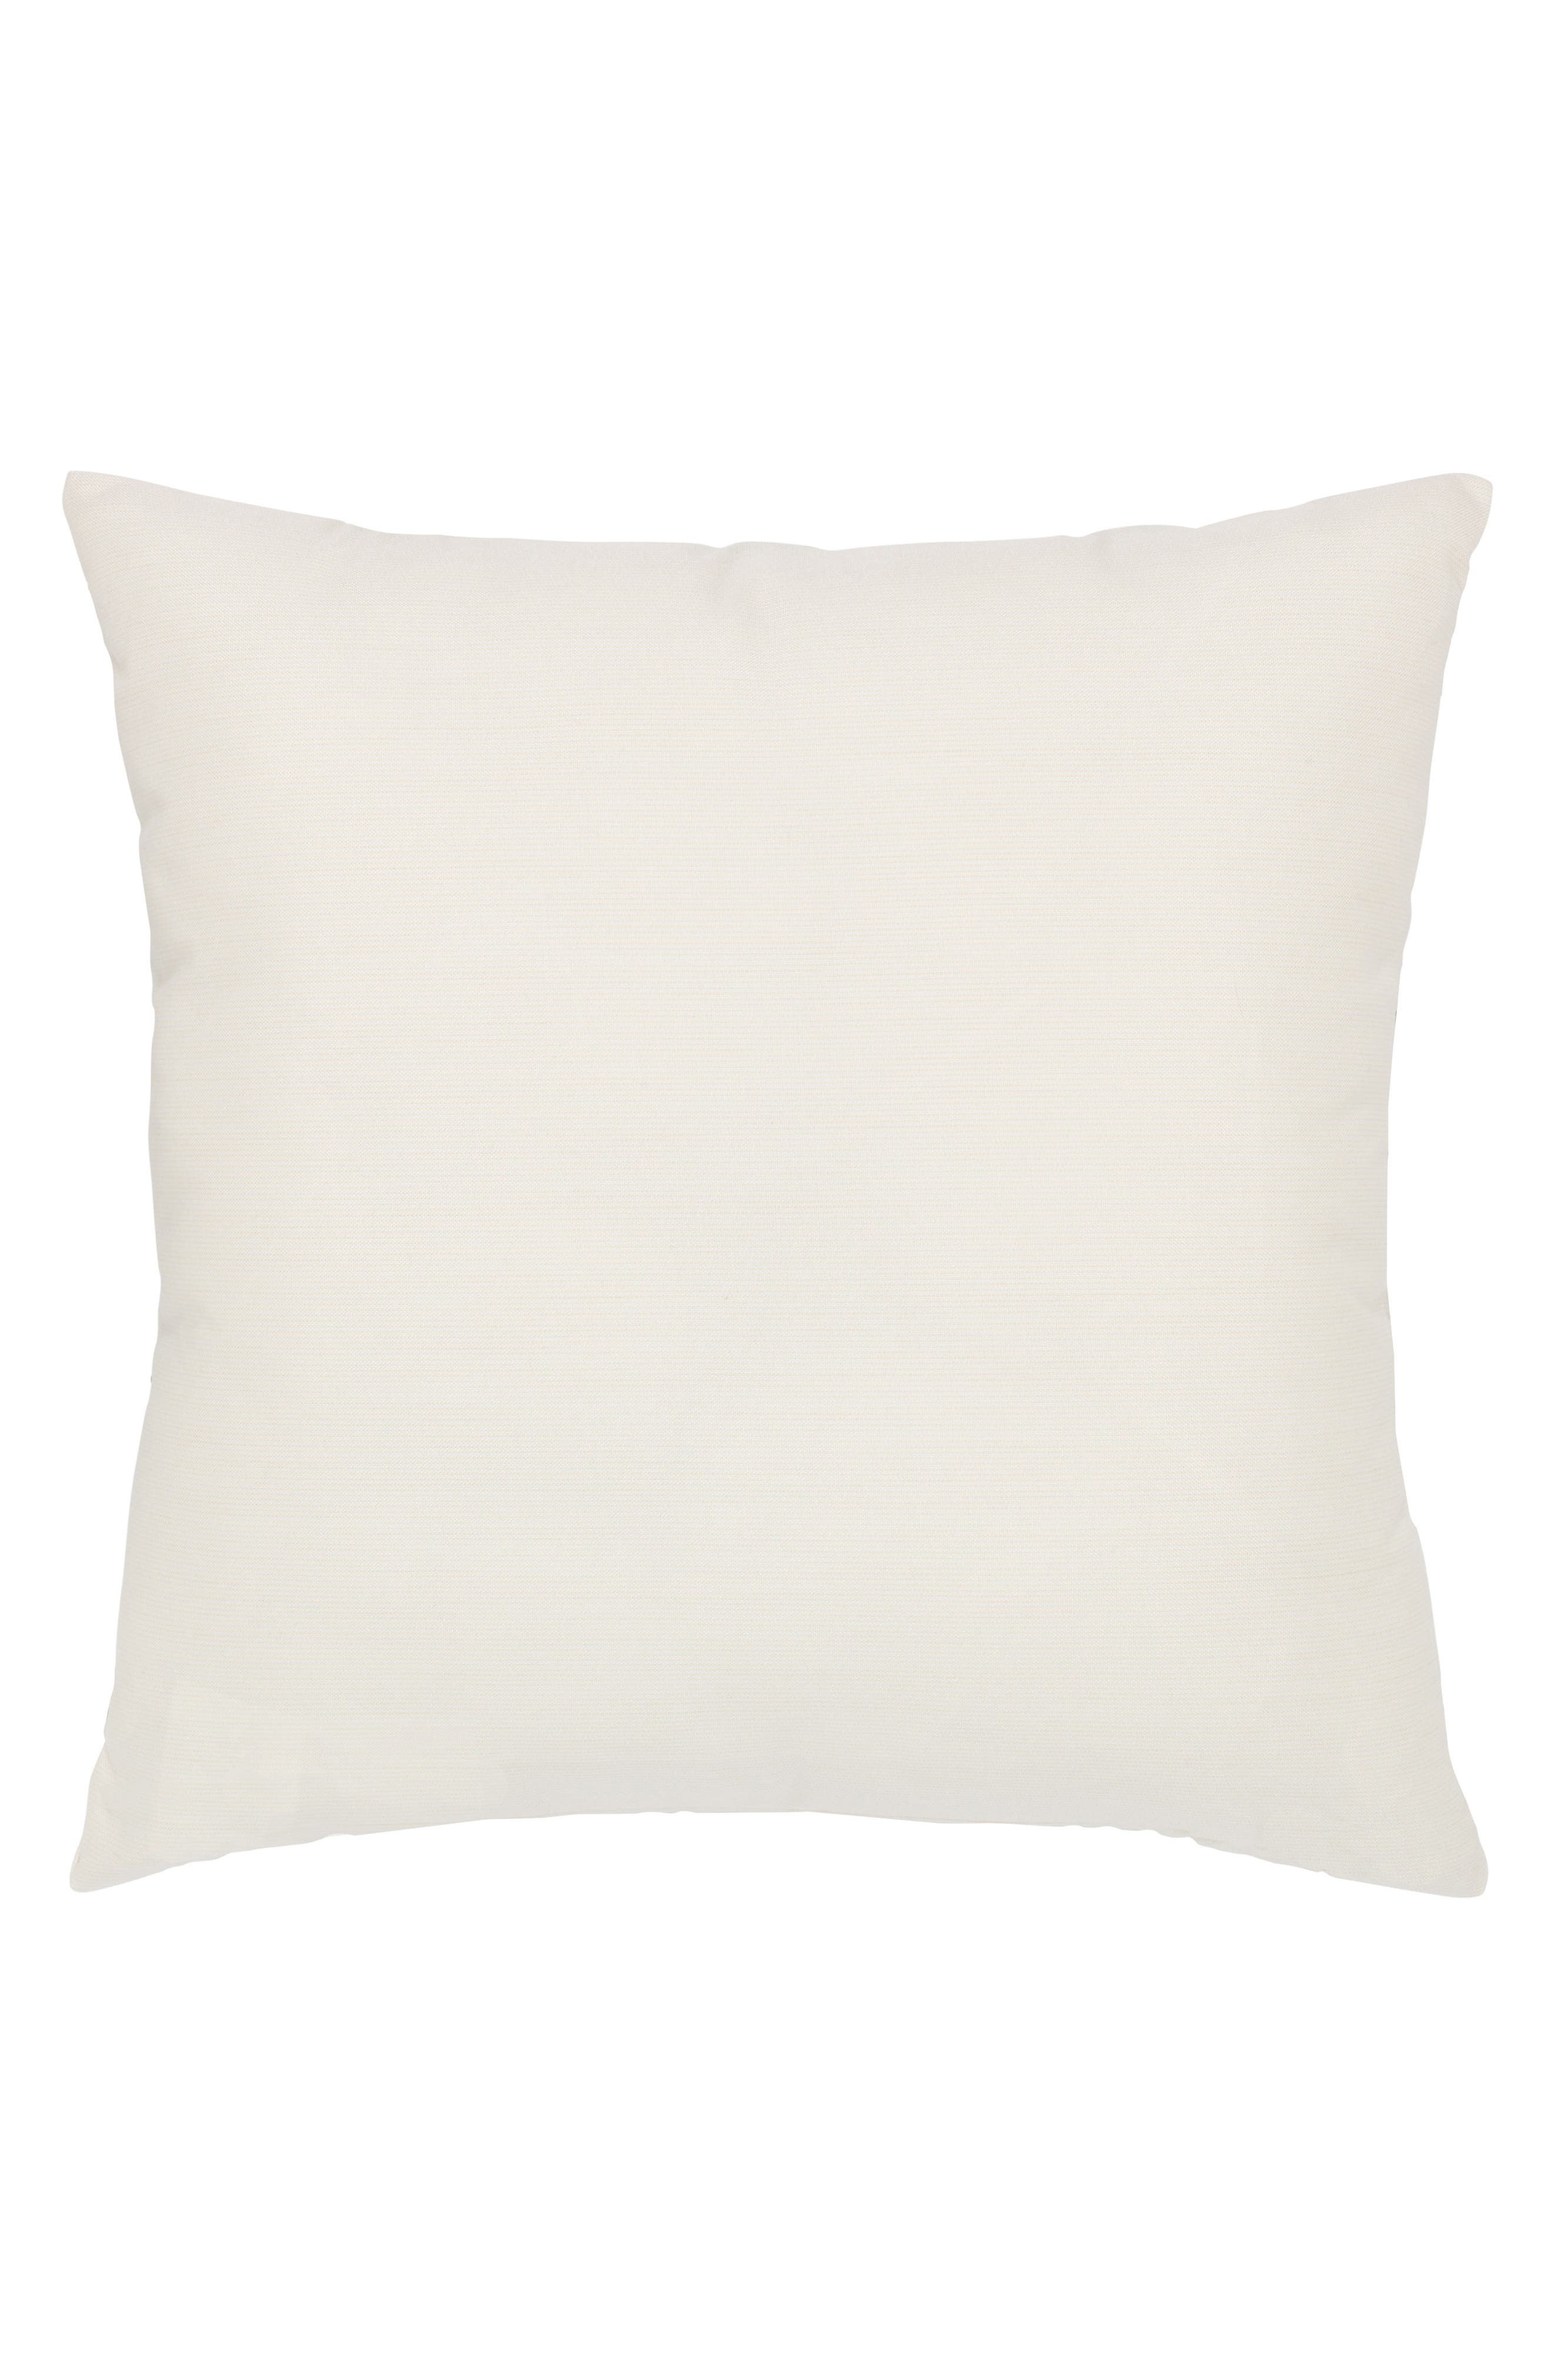 Delphi Indoor/Outdoor Accent Pillow,                             Alternate thumbnail 2, color,                             BLUE MULTI